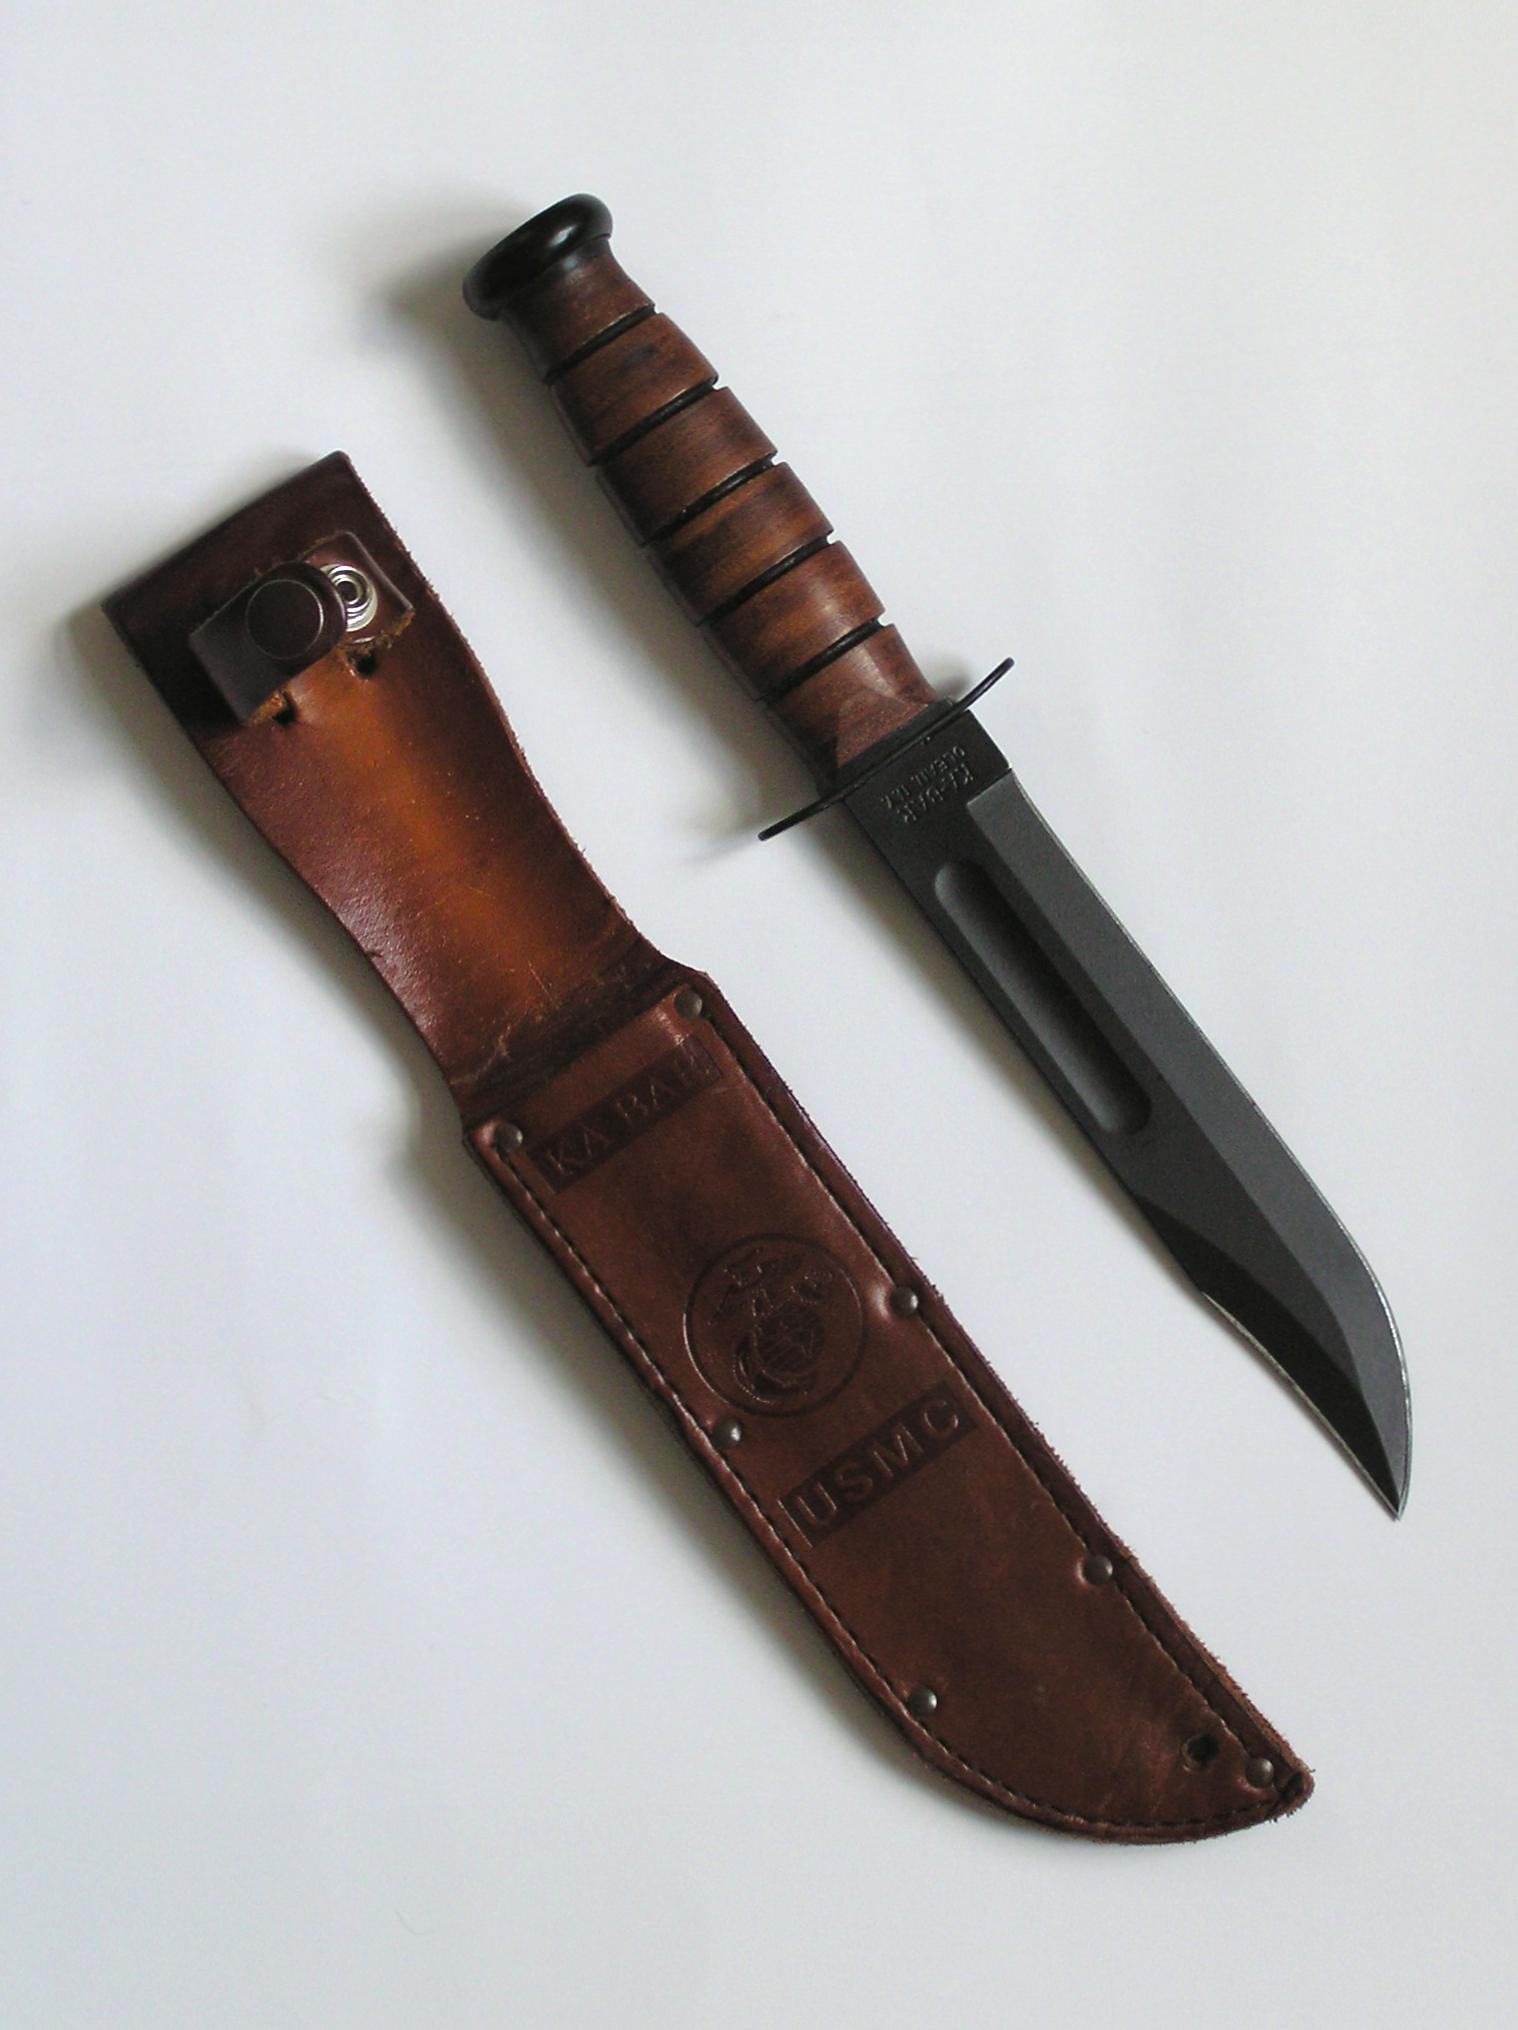 Ka bar good survival knife